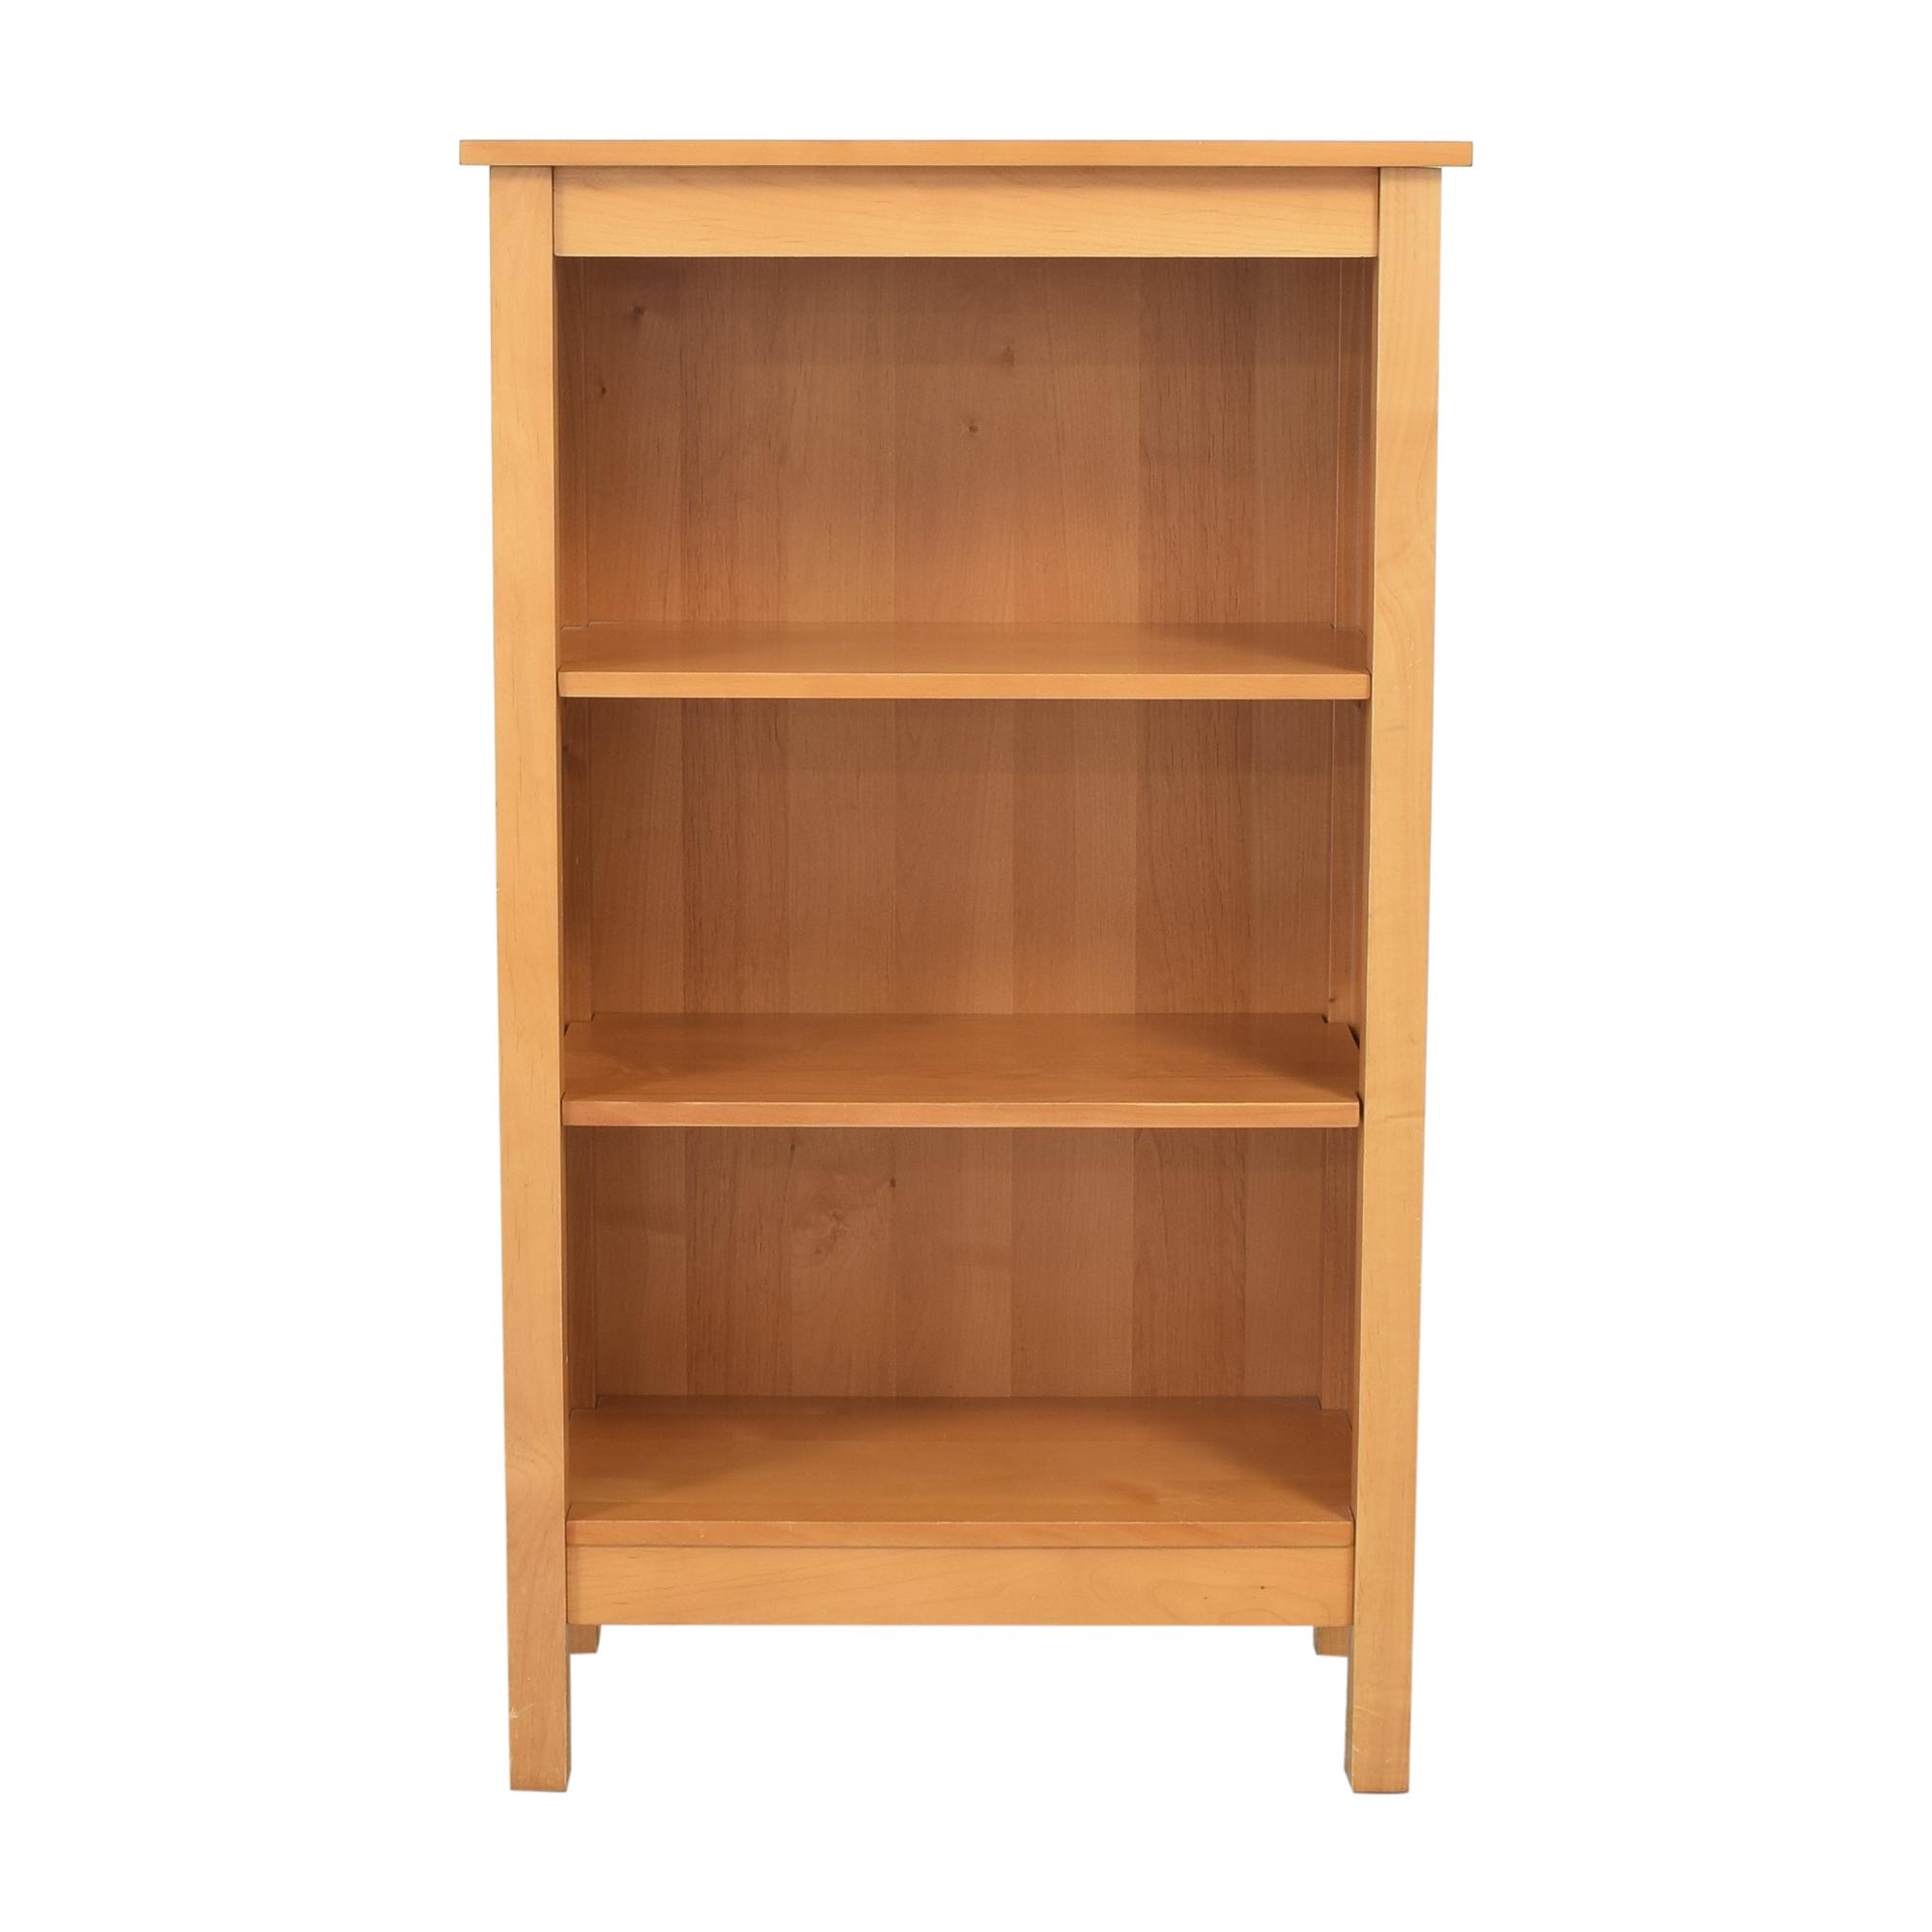 Land of Nod Land of Nod Simple Bookcase price